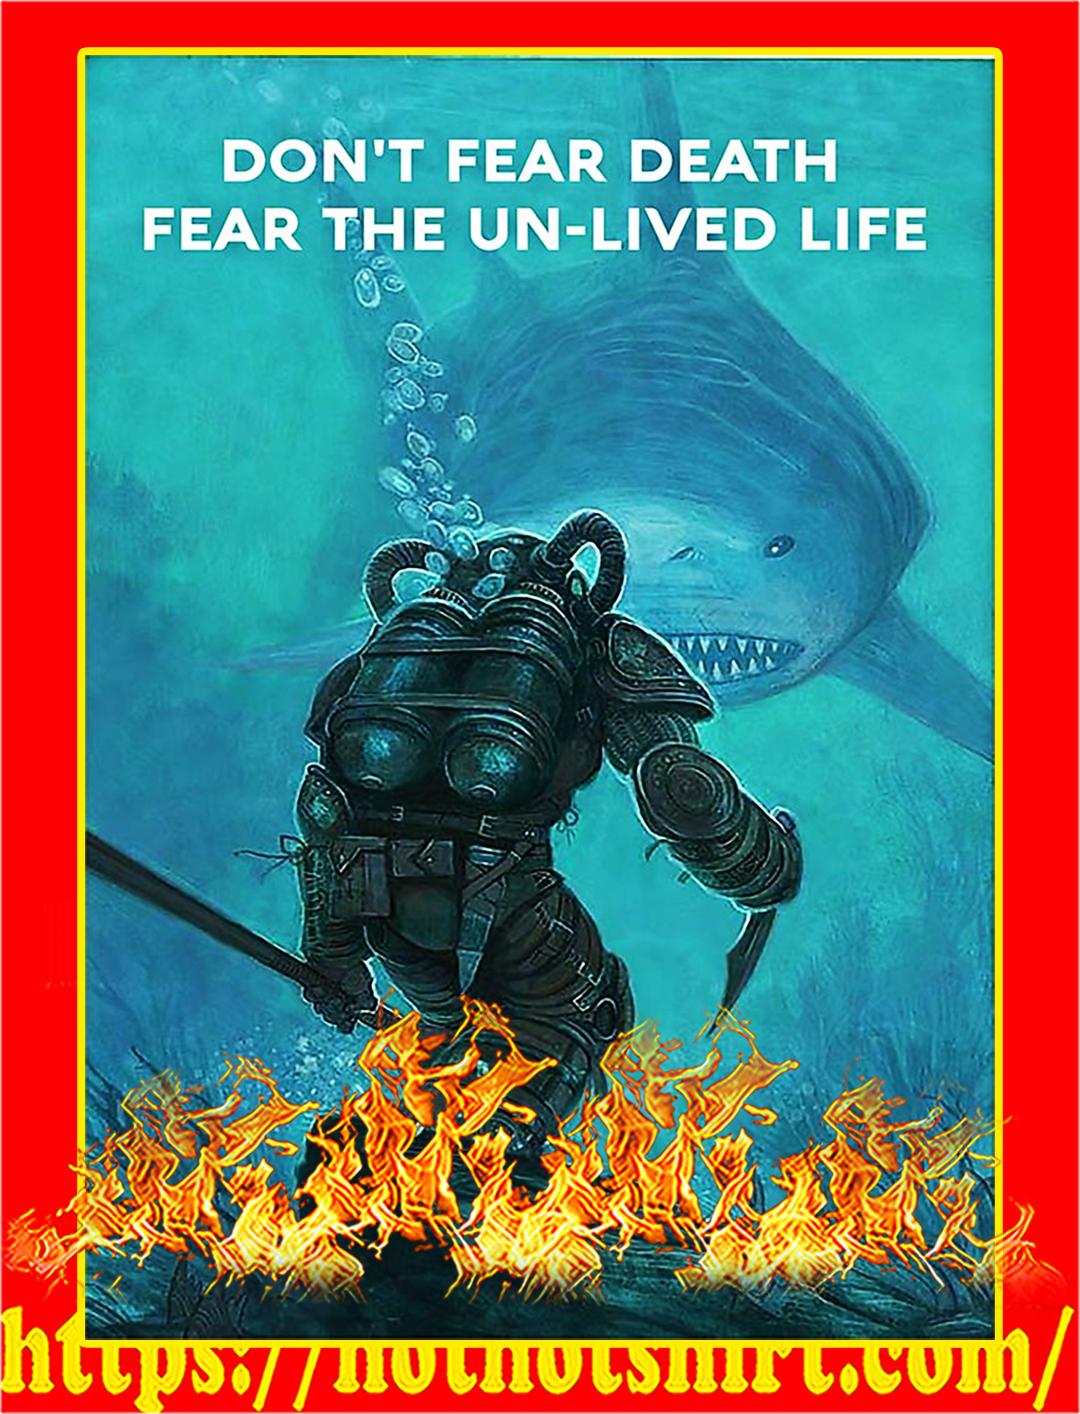 Scuba Don't fear death fear the un-lived life poster - A1